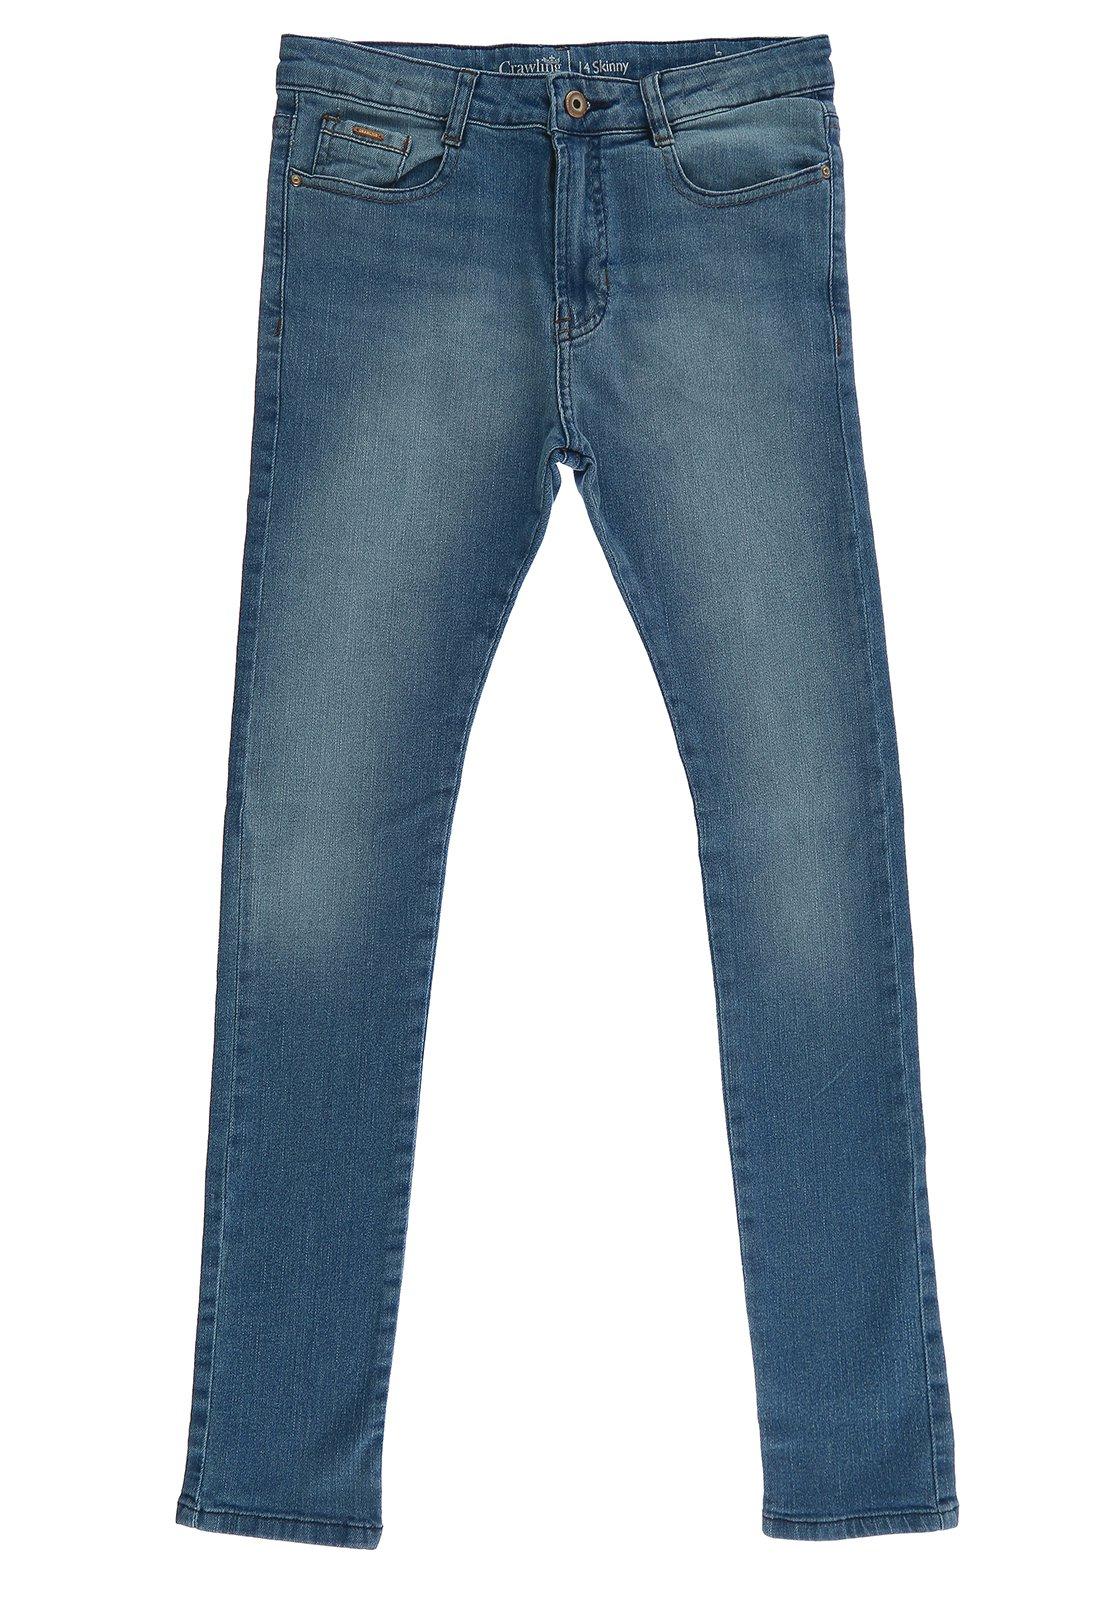 Calça Jeans Masclina Skinny Crawling